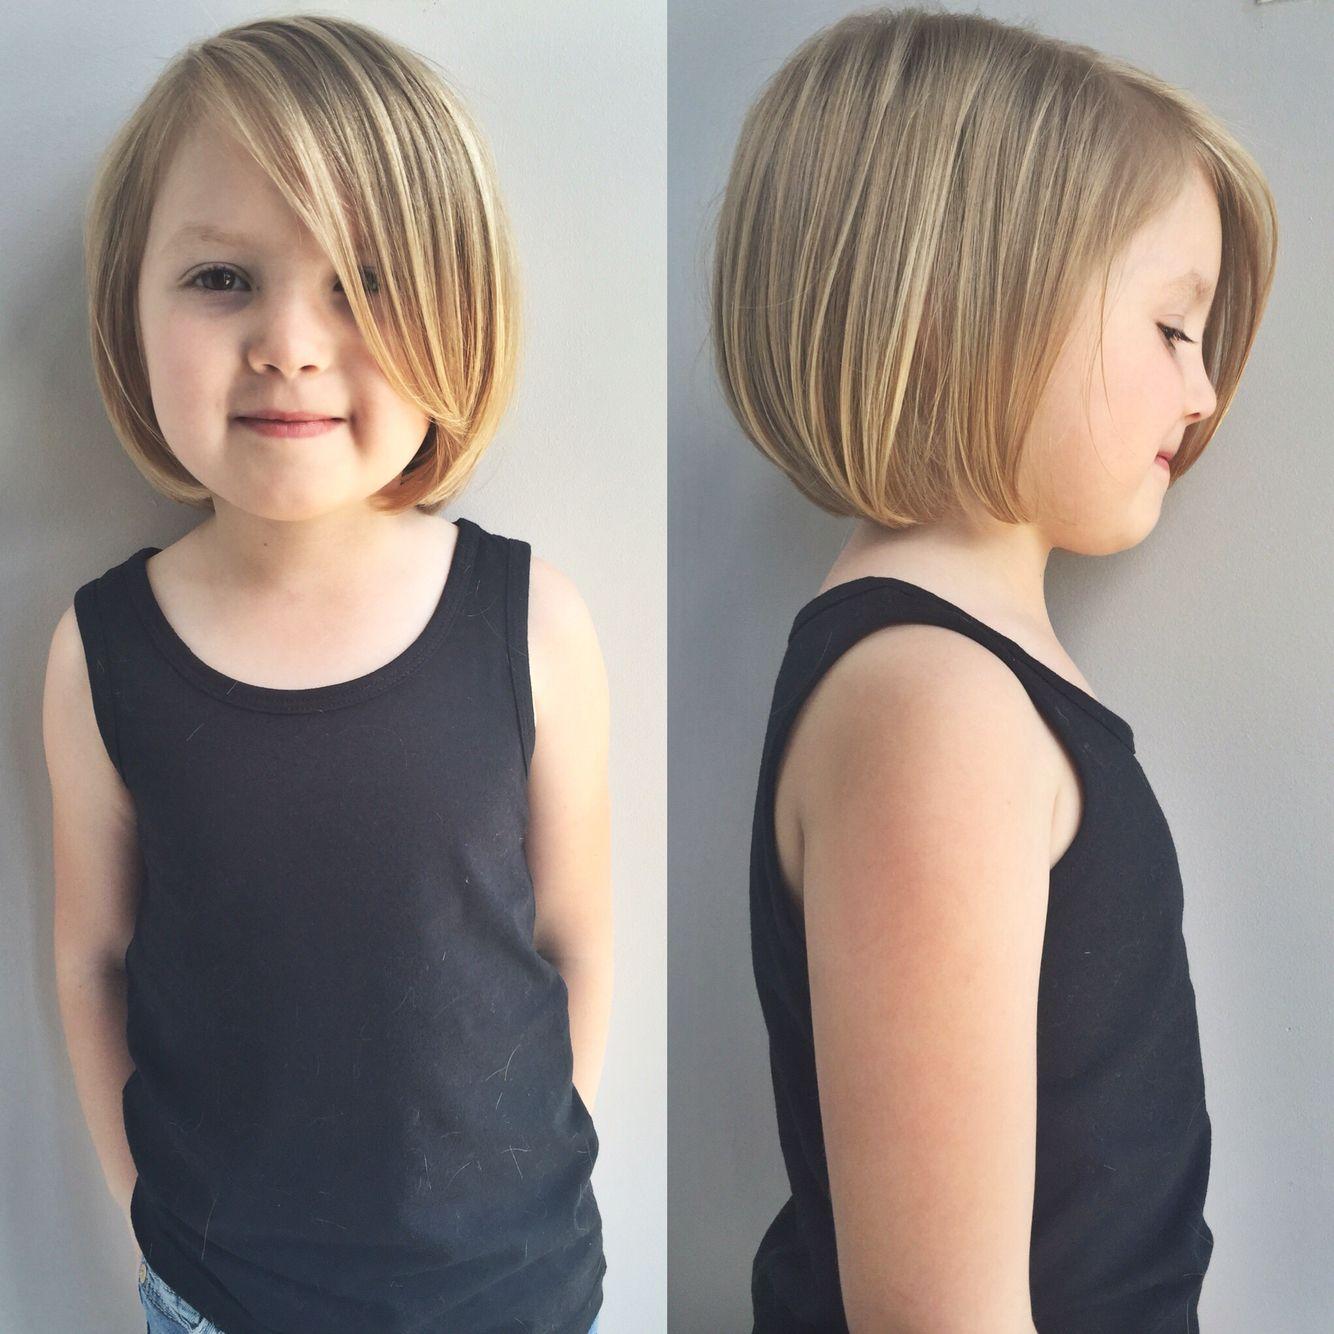 Cute Haircuts For Kids